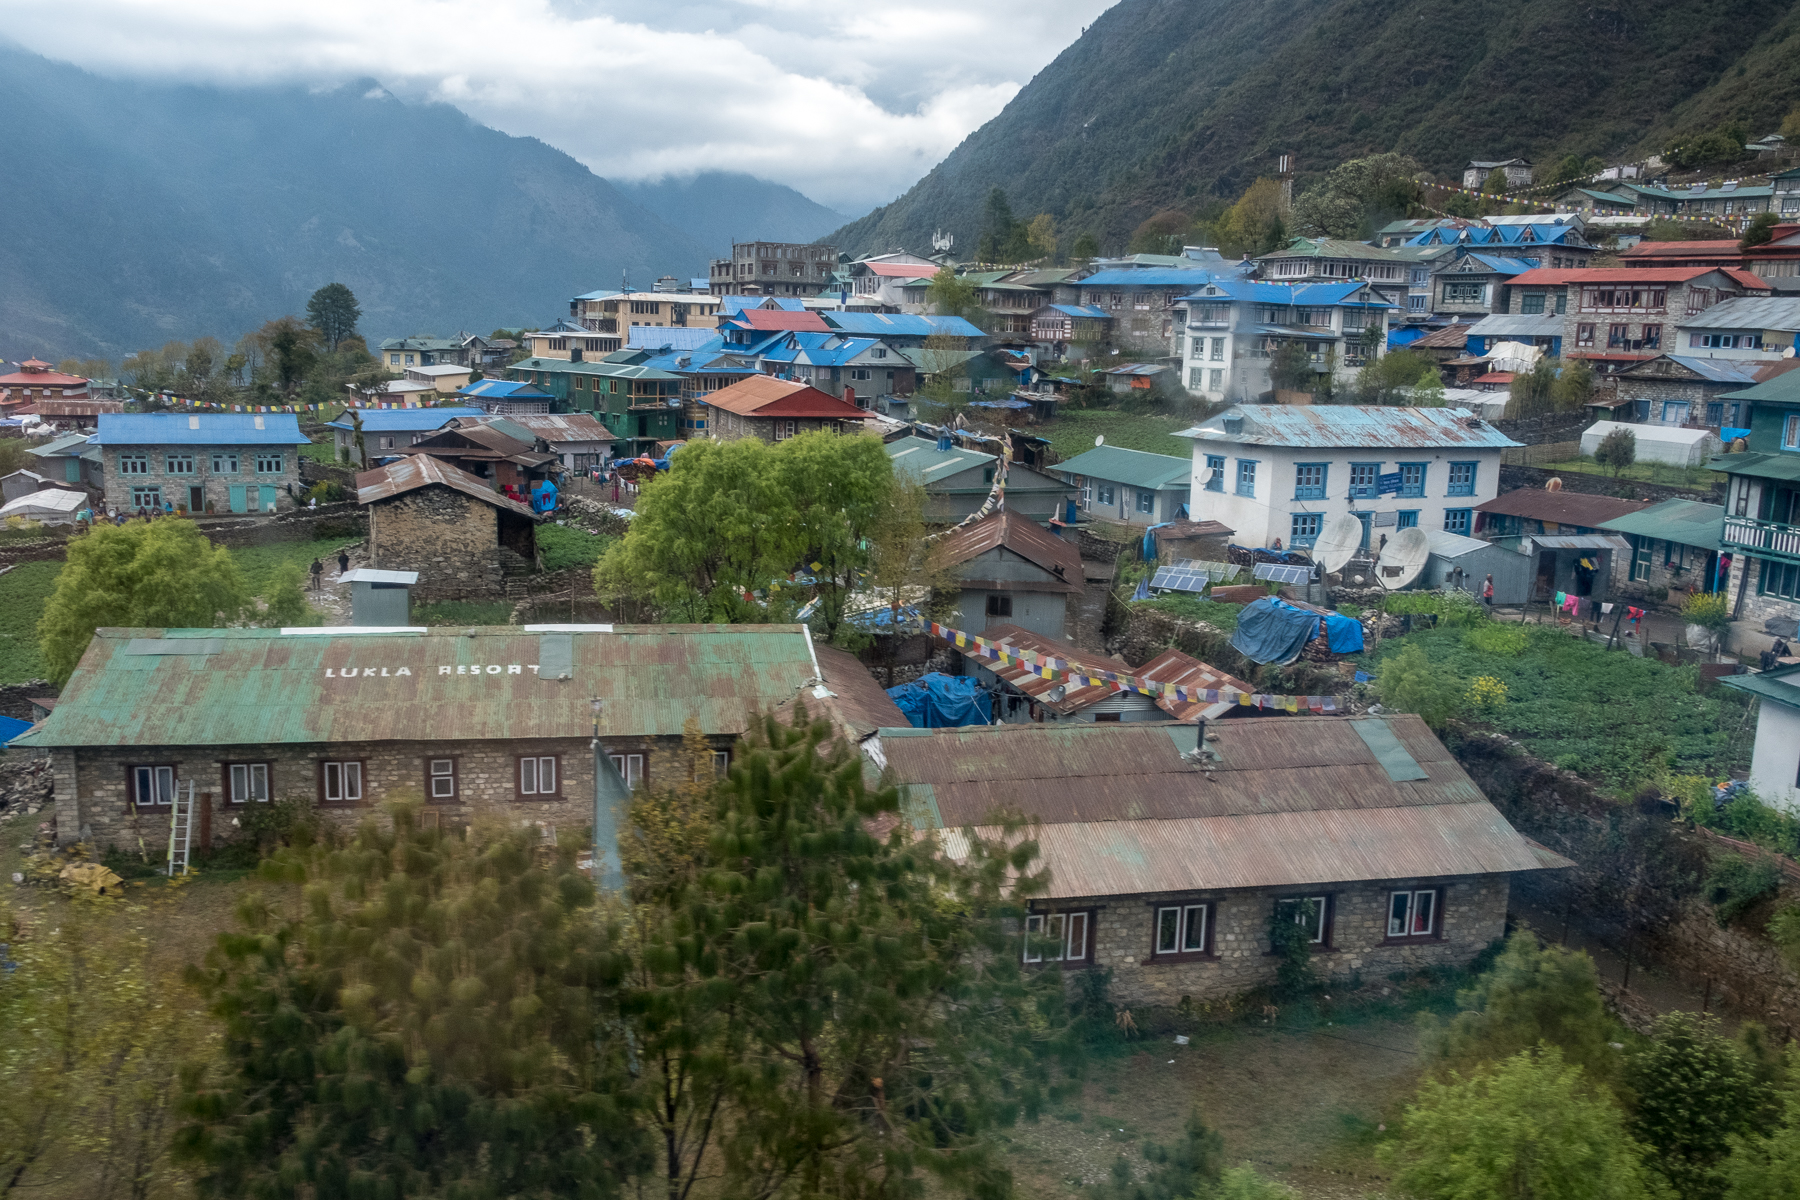 Views of Lukla during helicopter landing at Lukla Airport, Nepal.